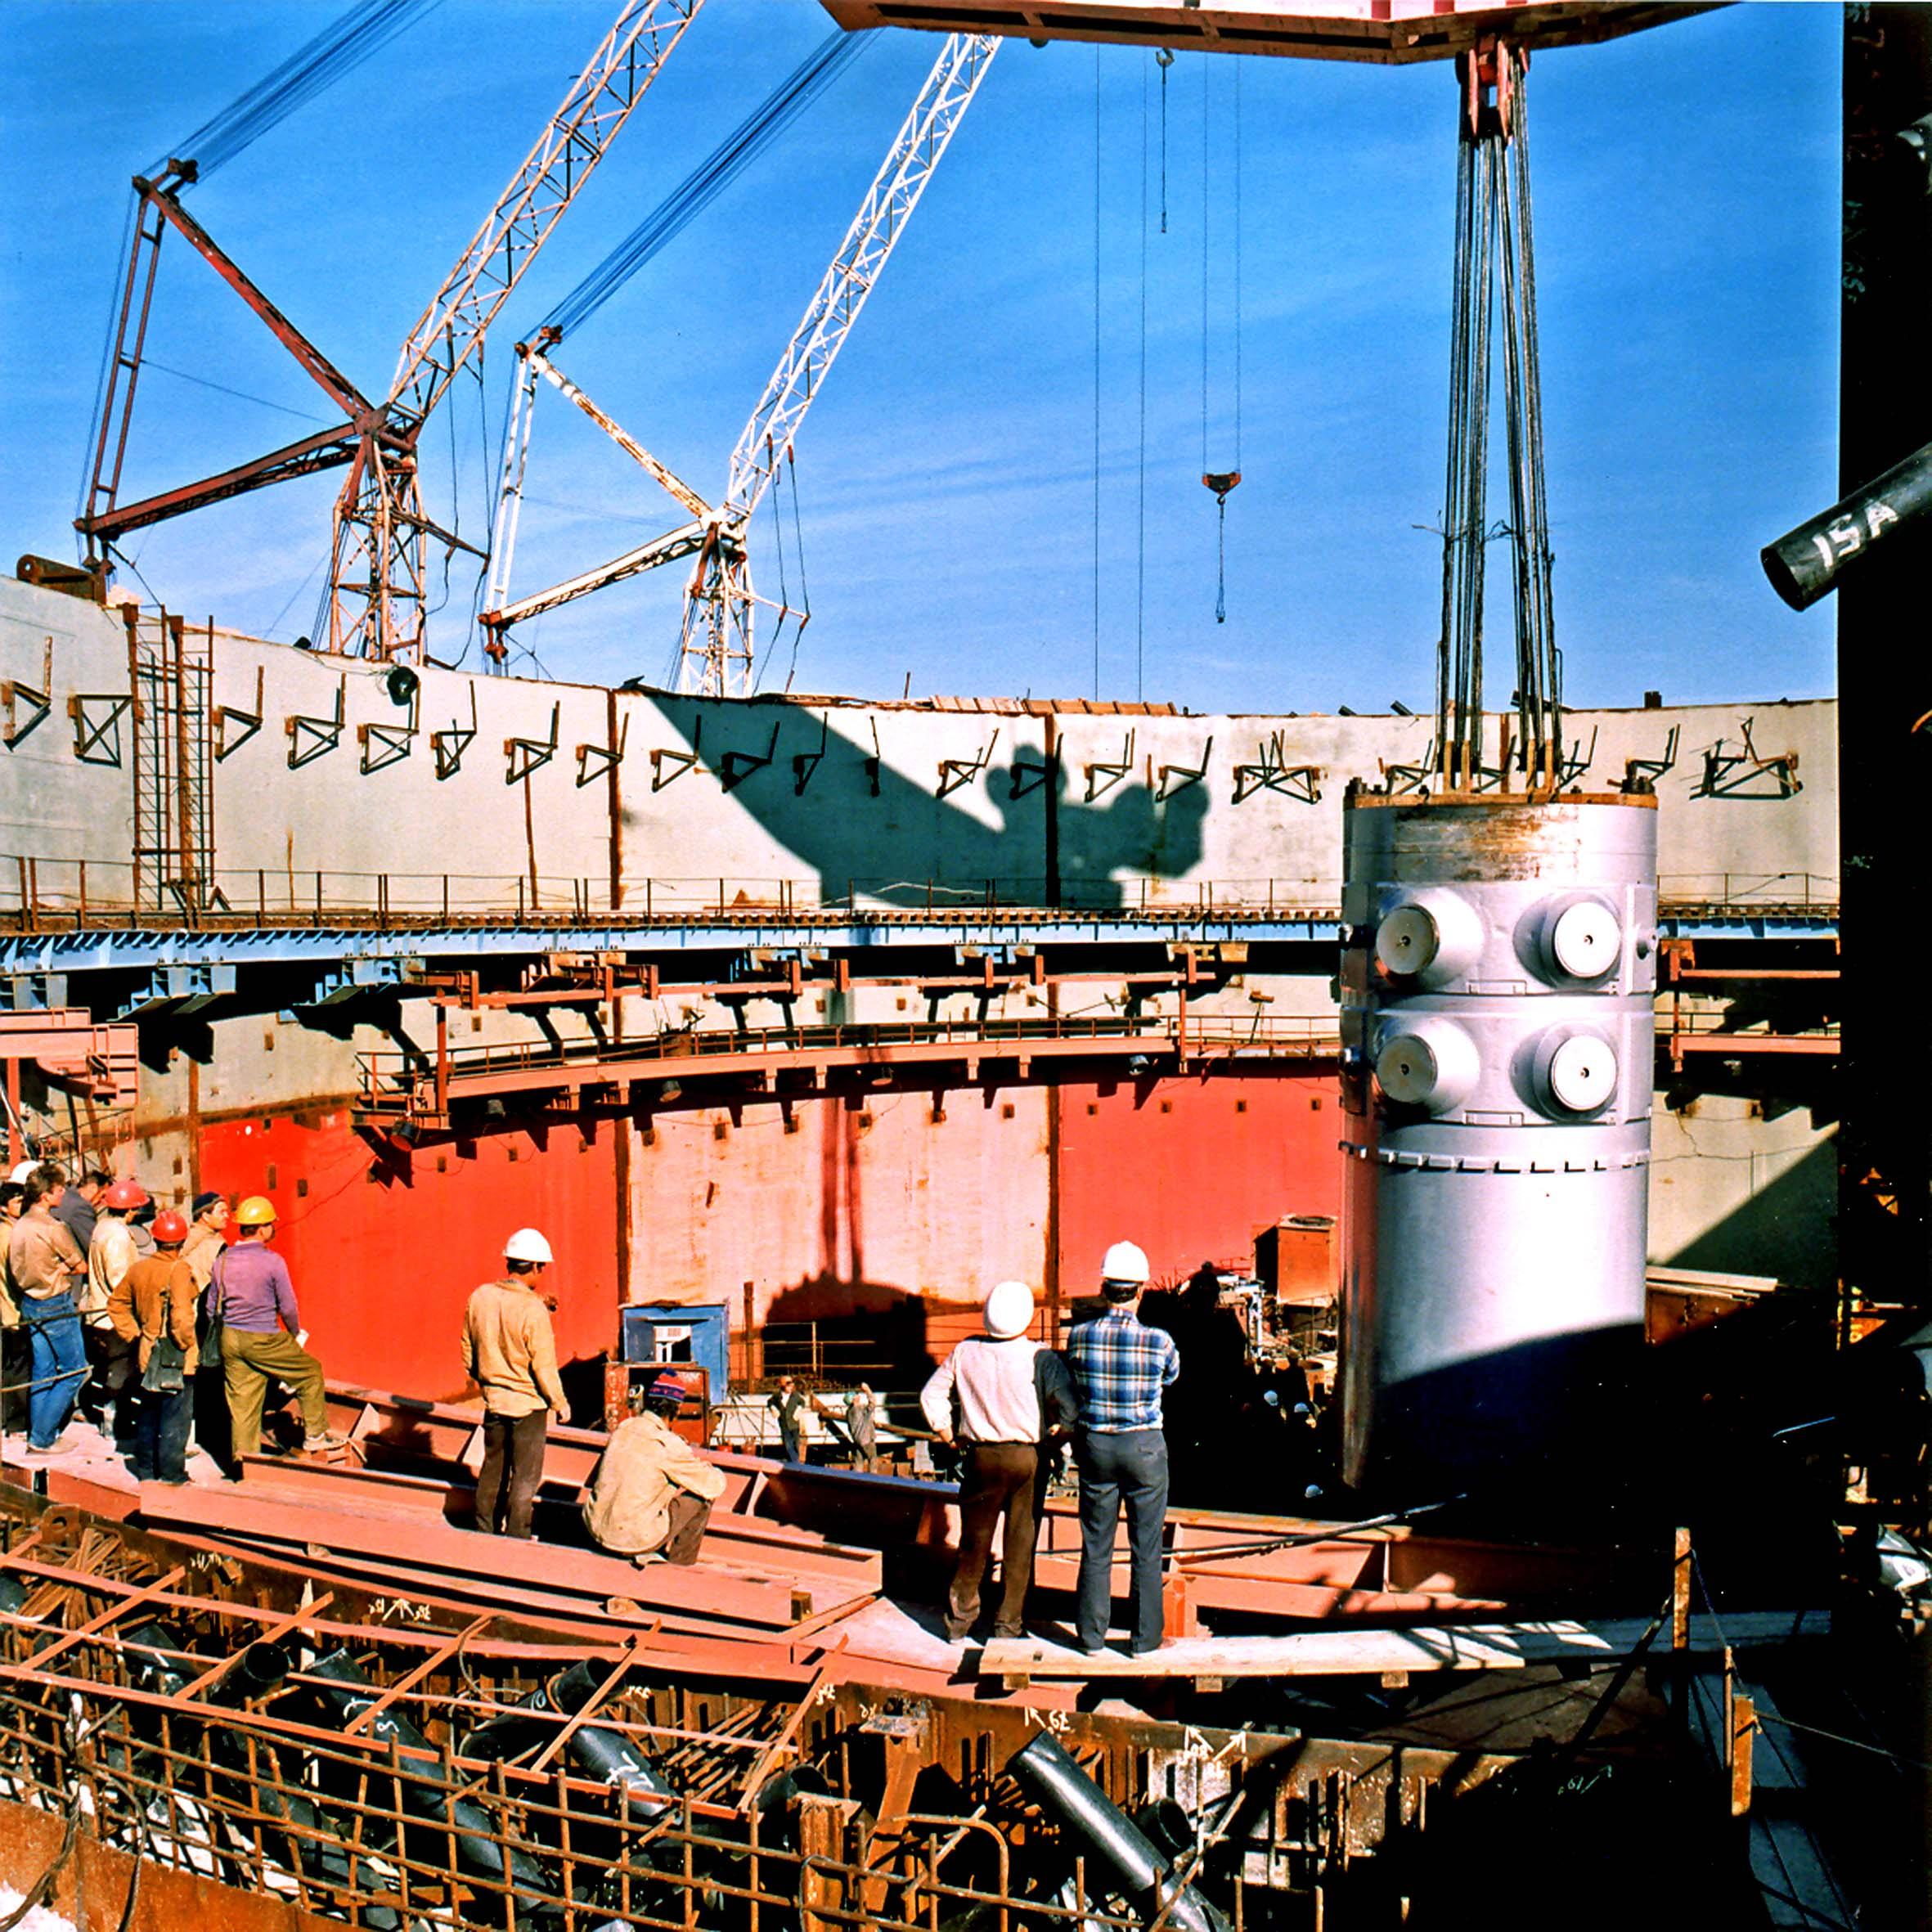 Гидроизоляция подводной лодки - строительство википедия трап в санузле гидроизоляция